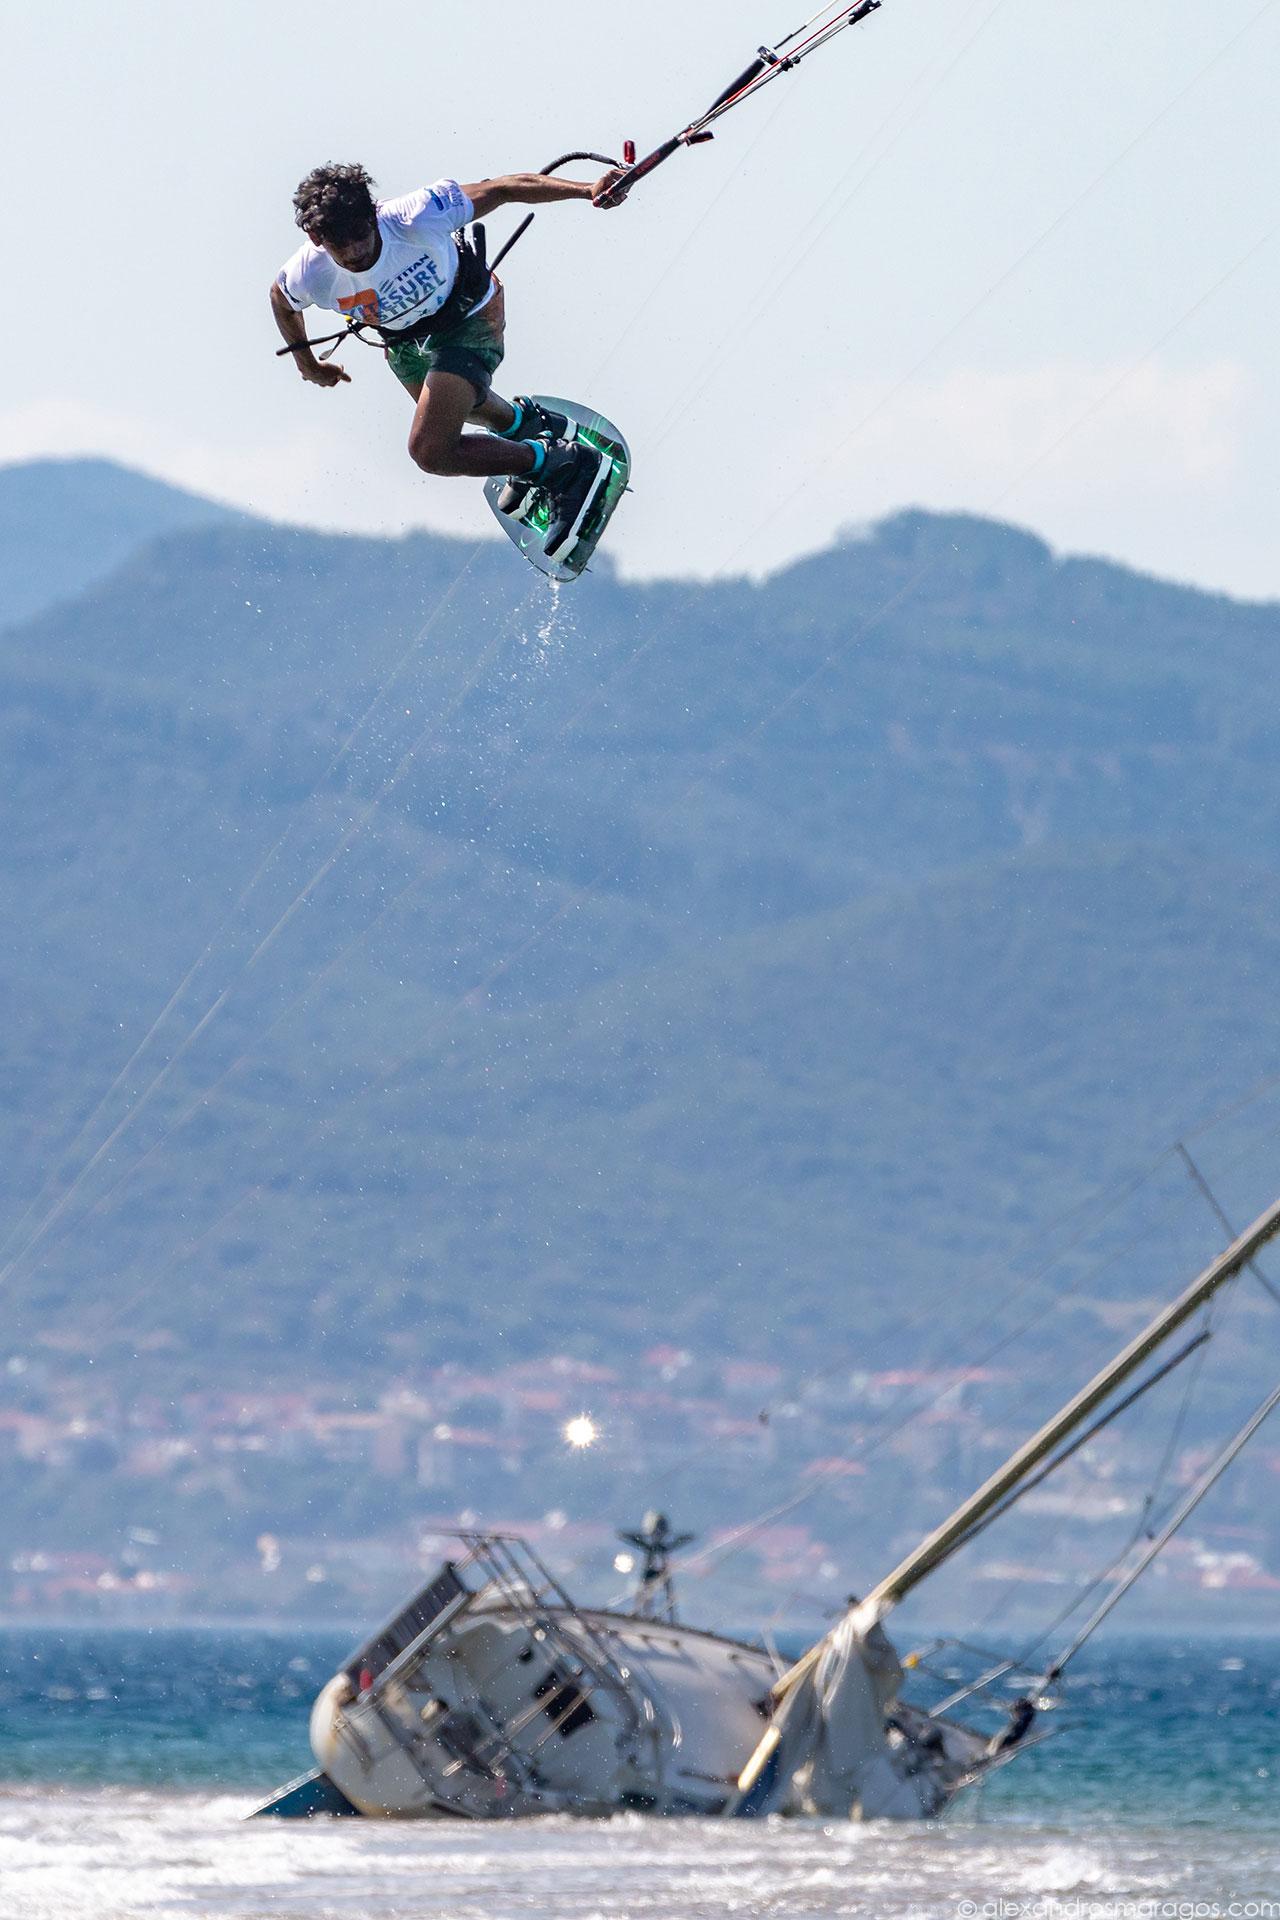 Carlos Mario performing at the Kitesurf Festival, Cape Drepano, Greece |© Alexandros Maragos